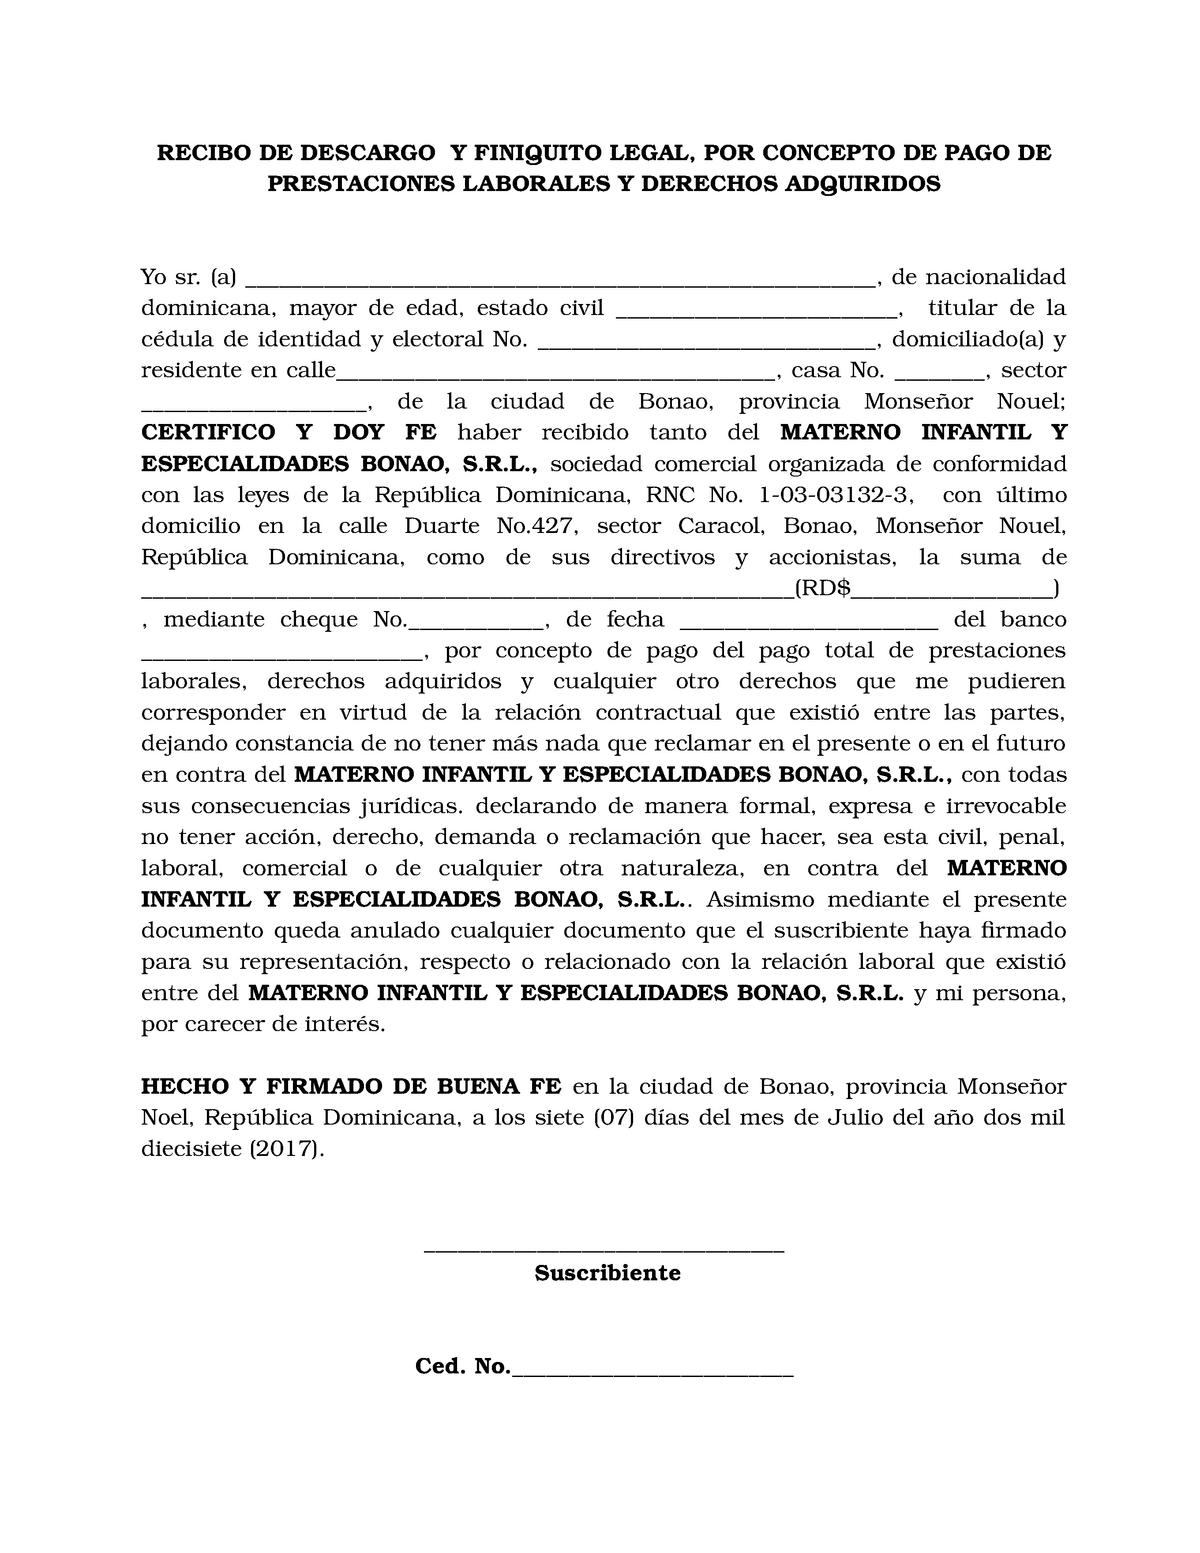 Modelo Recibo De Descargo Y Finiquito Legal Studocu